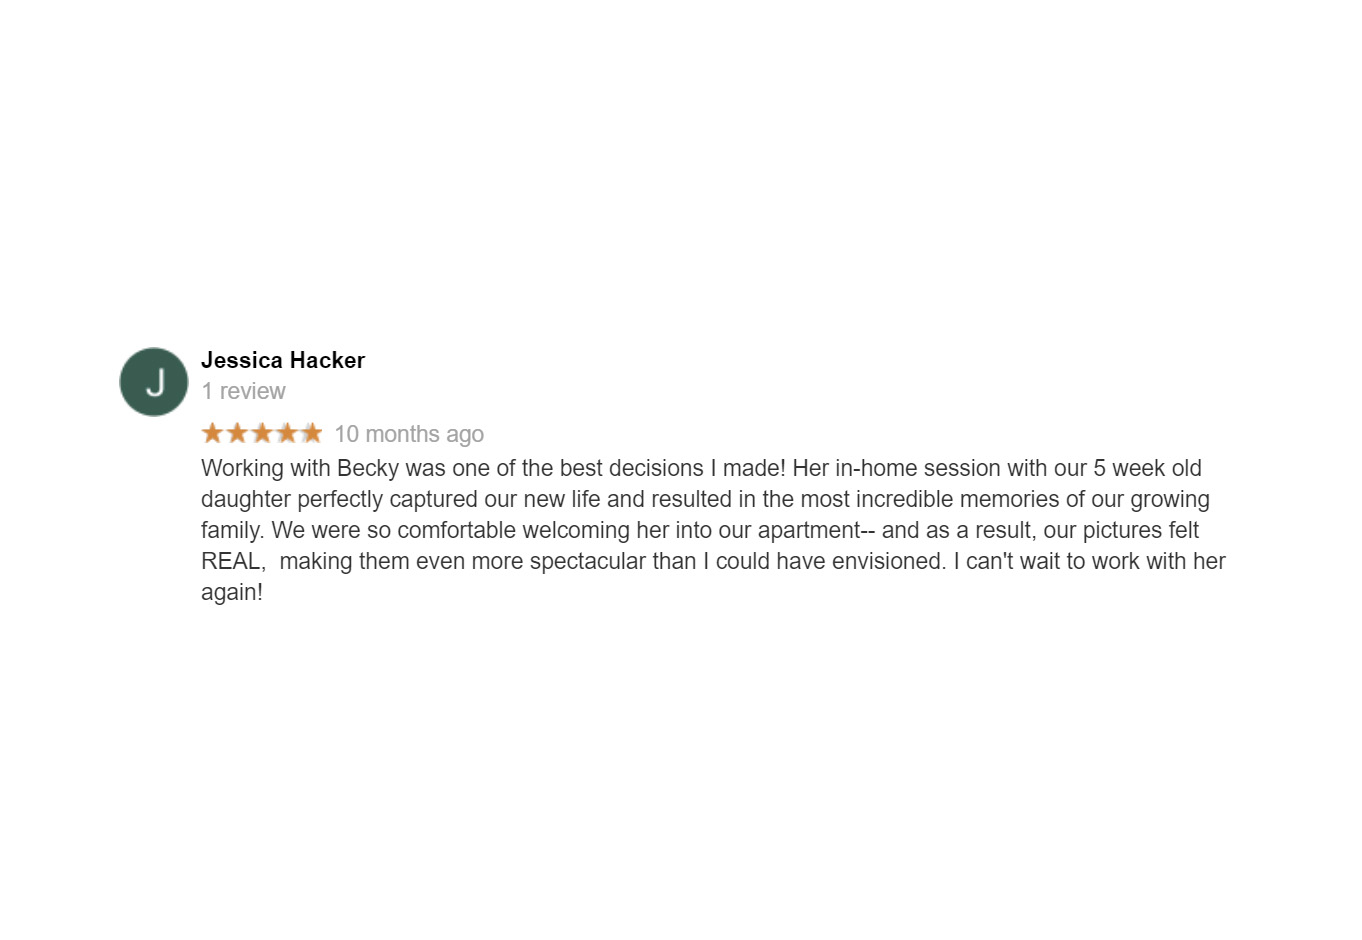 reviews_0011_Layer 51.jpg